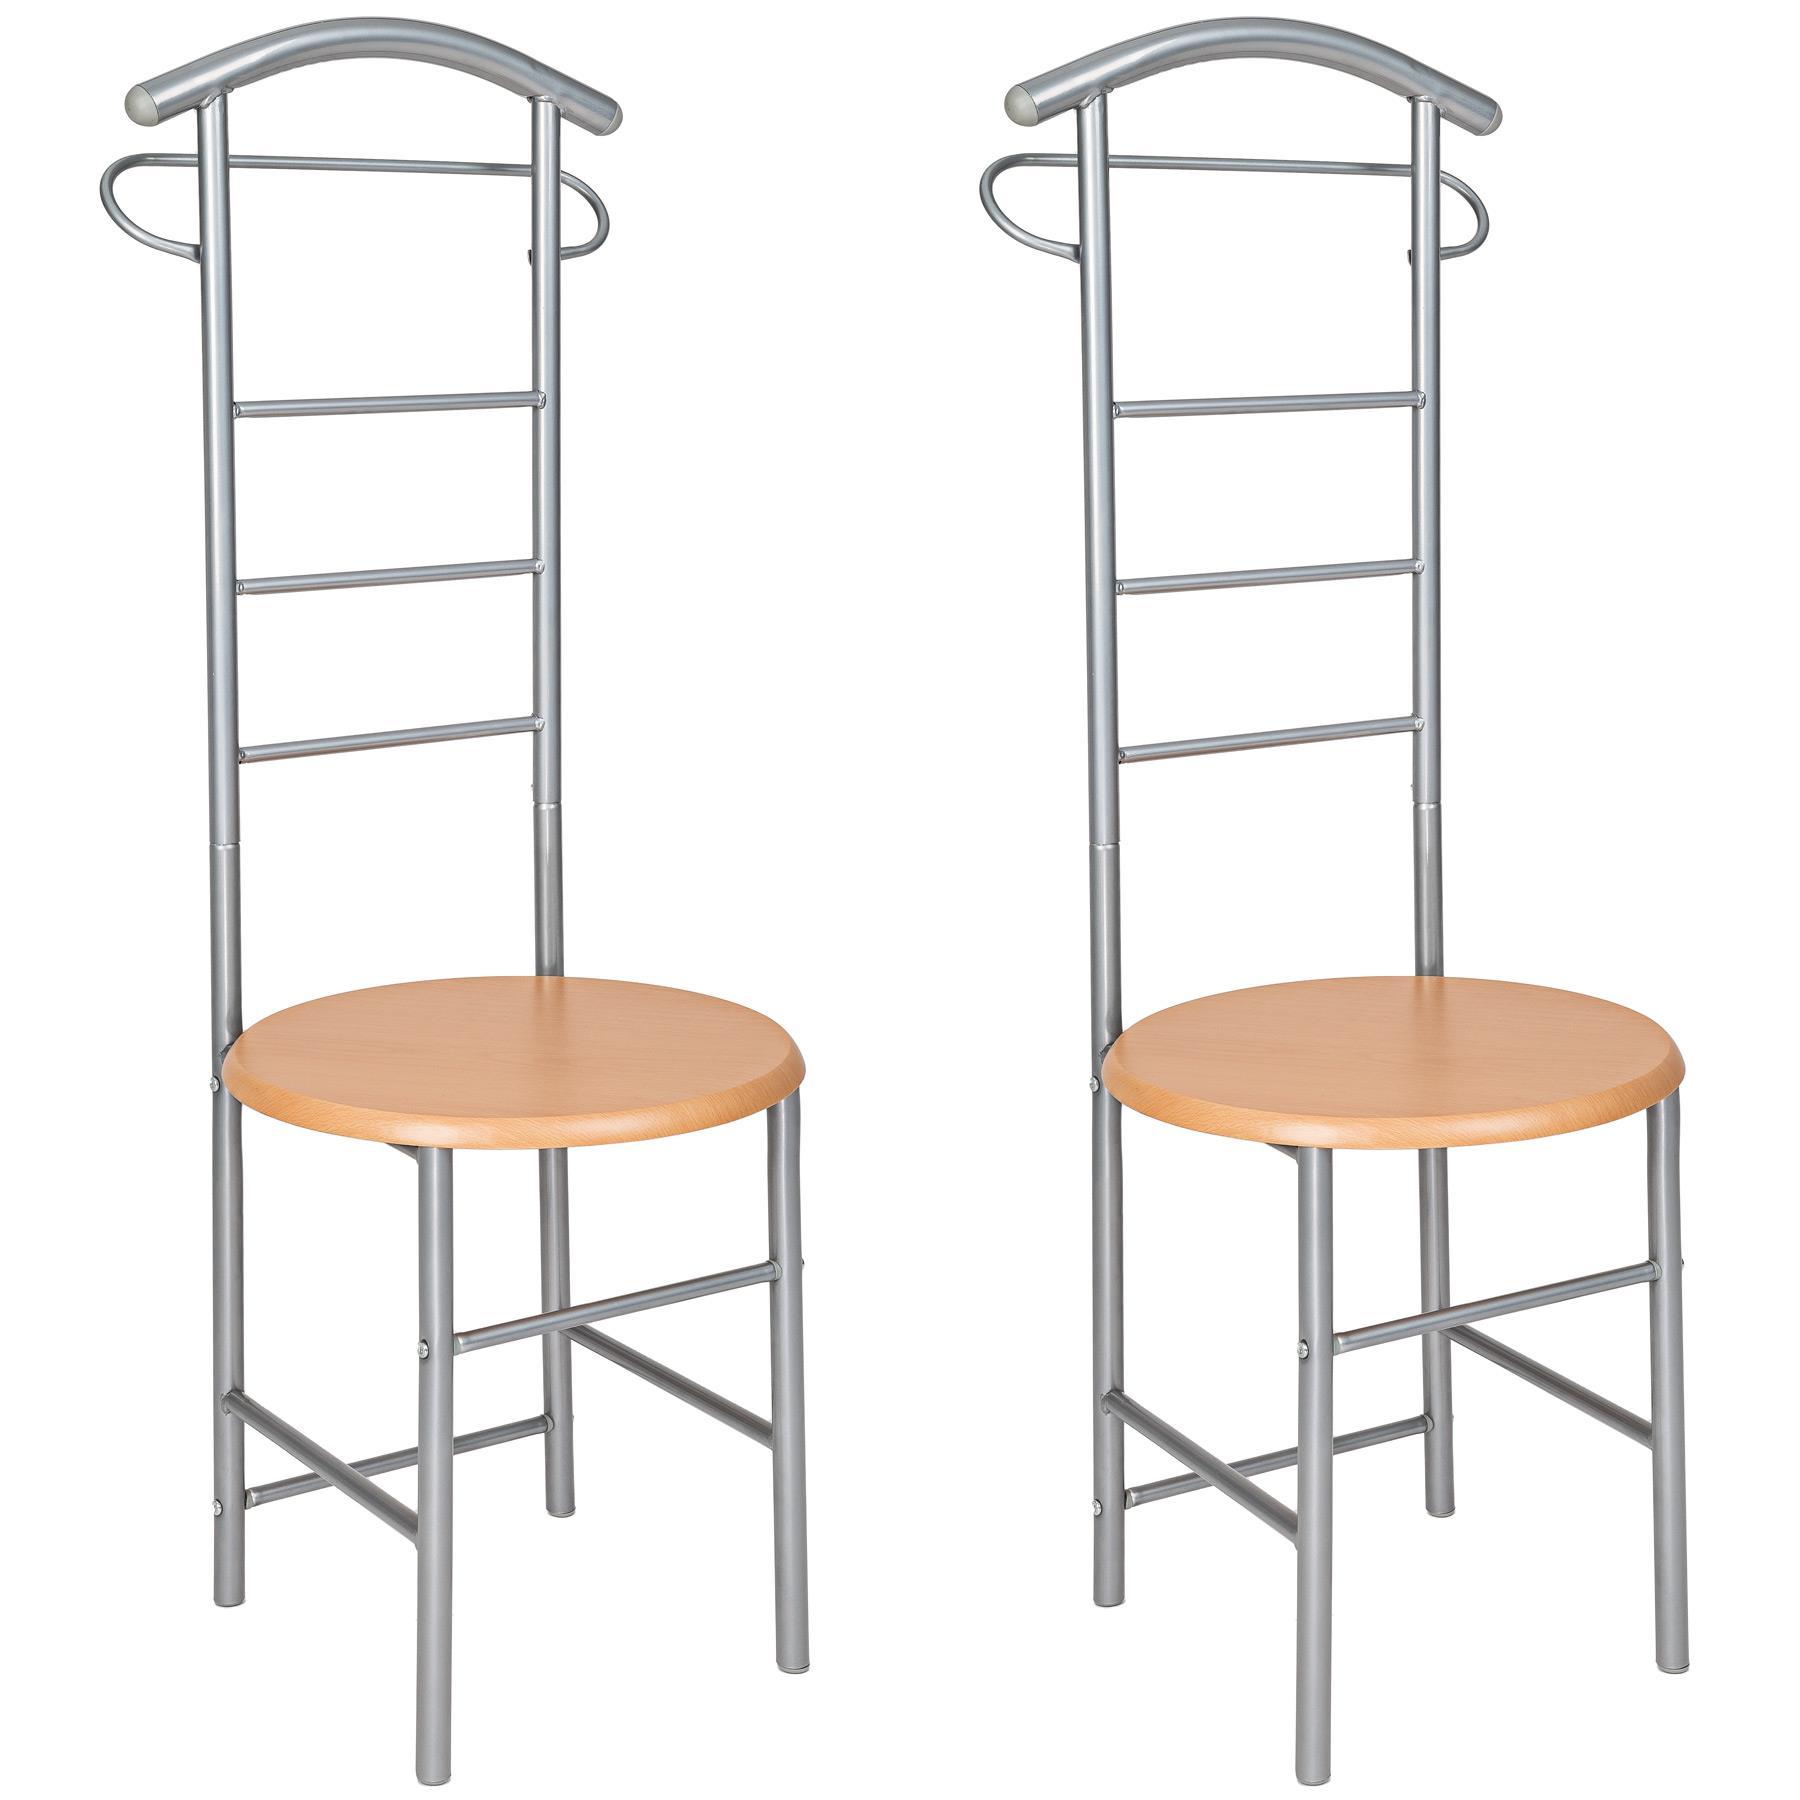 Kledingrek stoel 42 x 120 x 43 cm in zilver van tectake